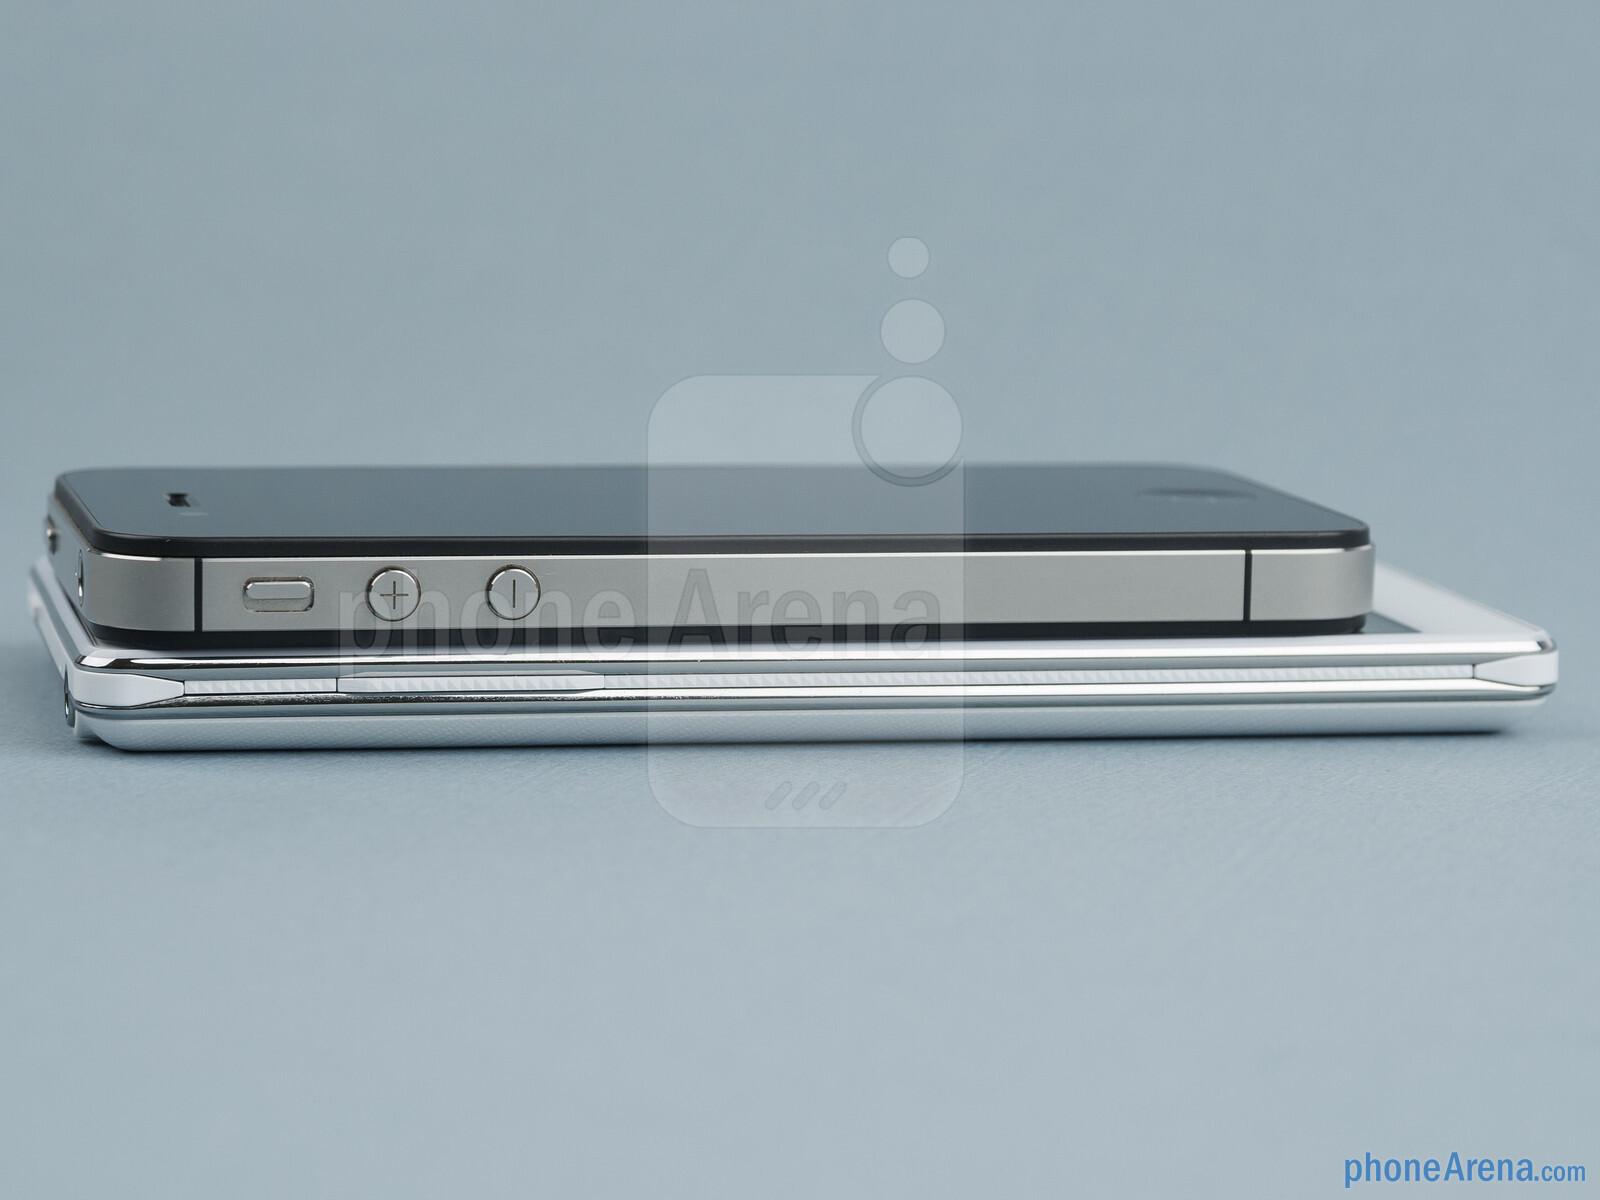 LG Optimus 4X HD vs Apple iPhone 4S